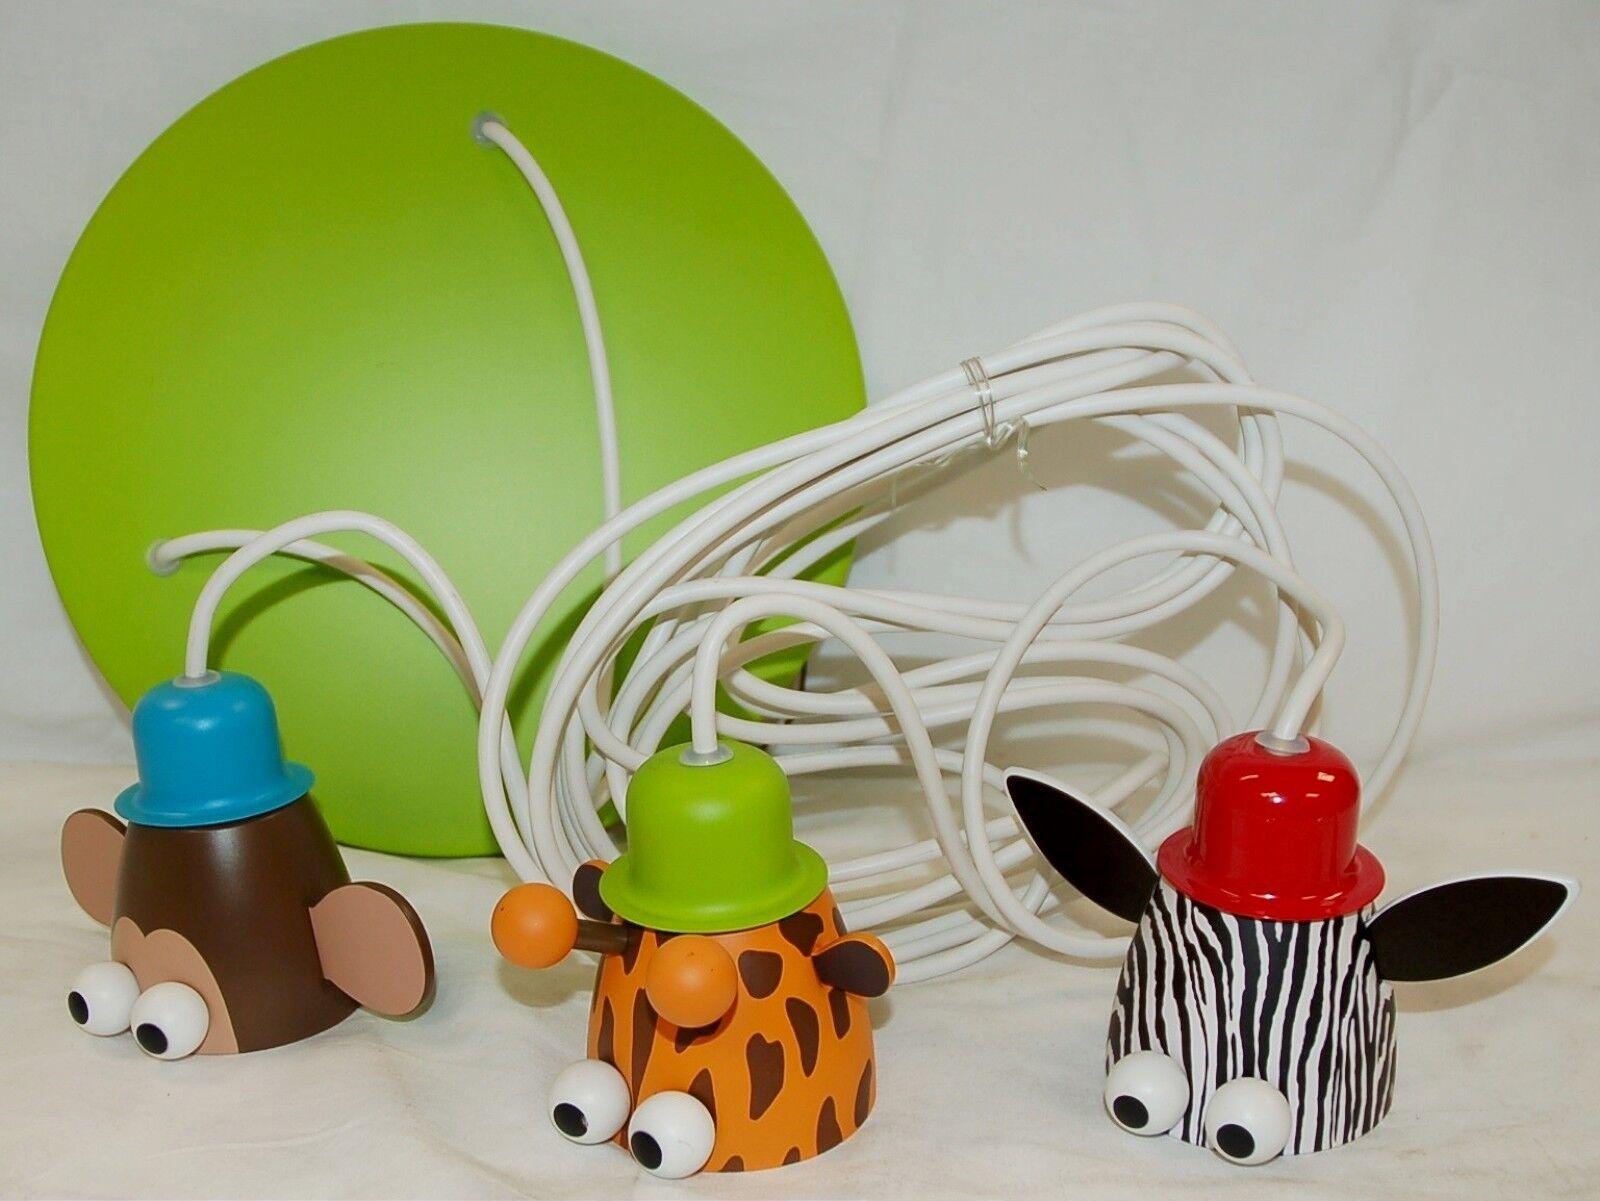 Philips Kidsplace Zoo Animal Suspension Light Ceiling Lamp